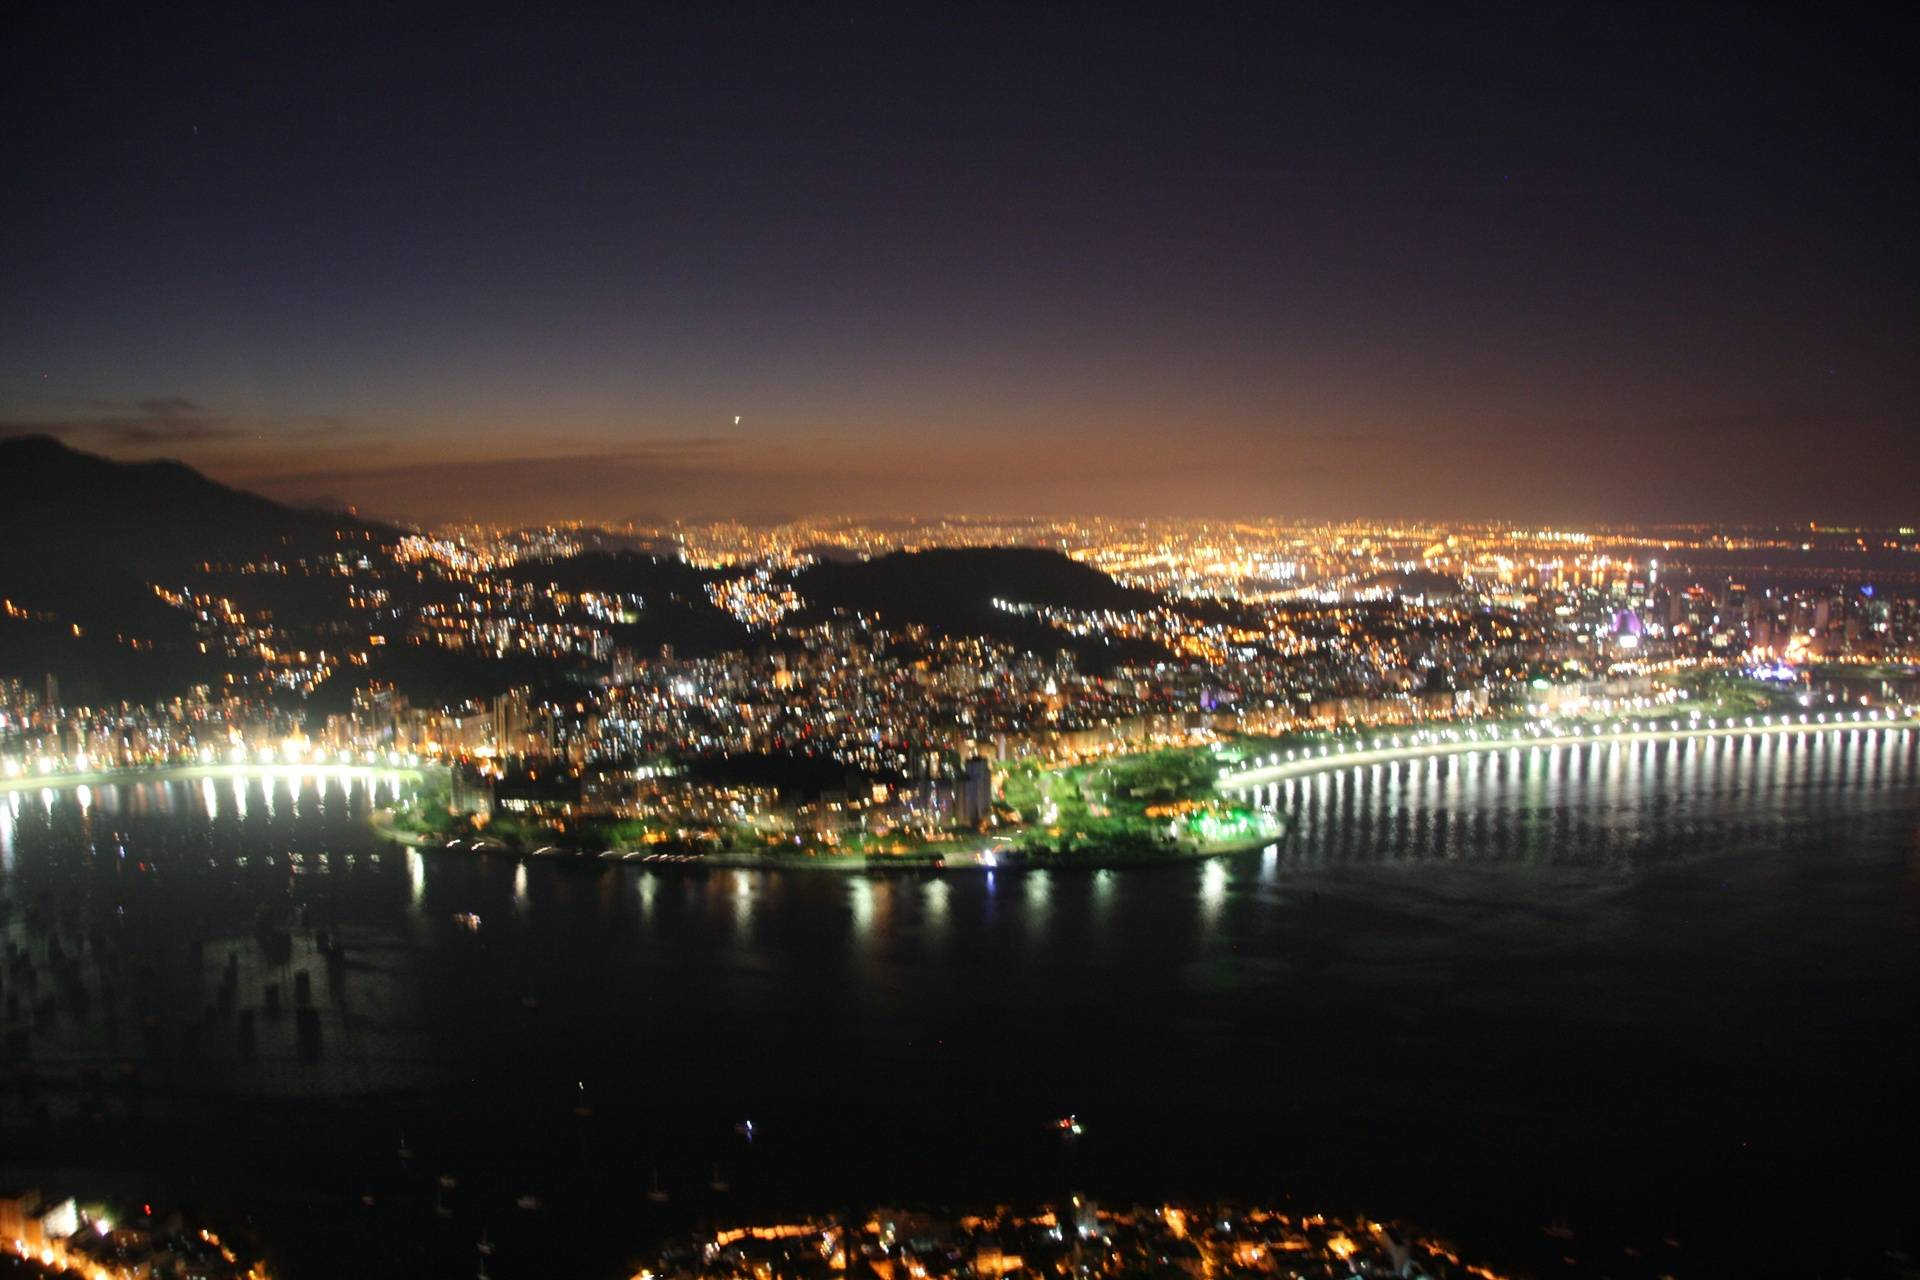 Night view - Sugarloaf Mountain, Rio